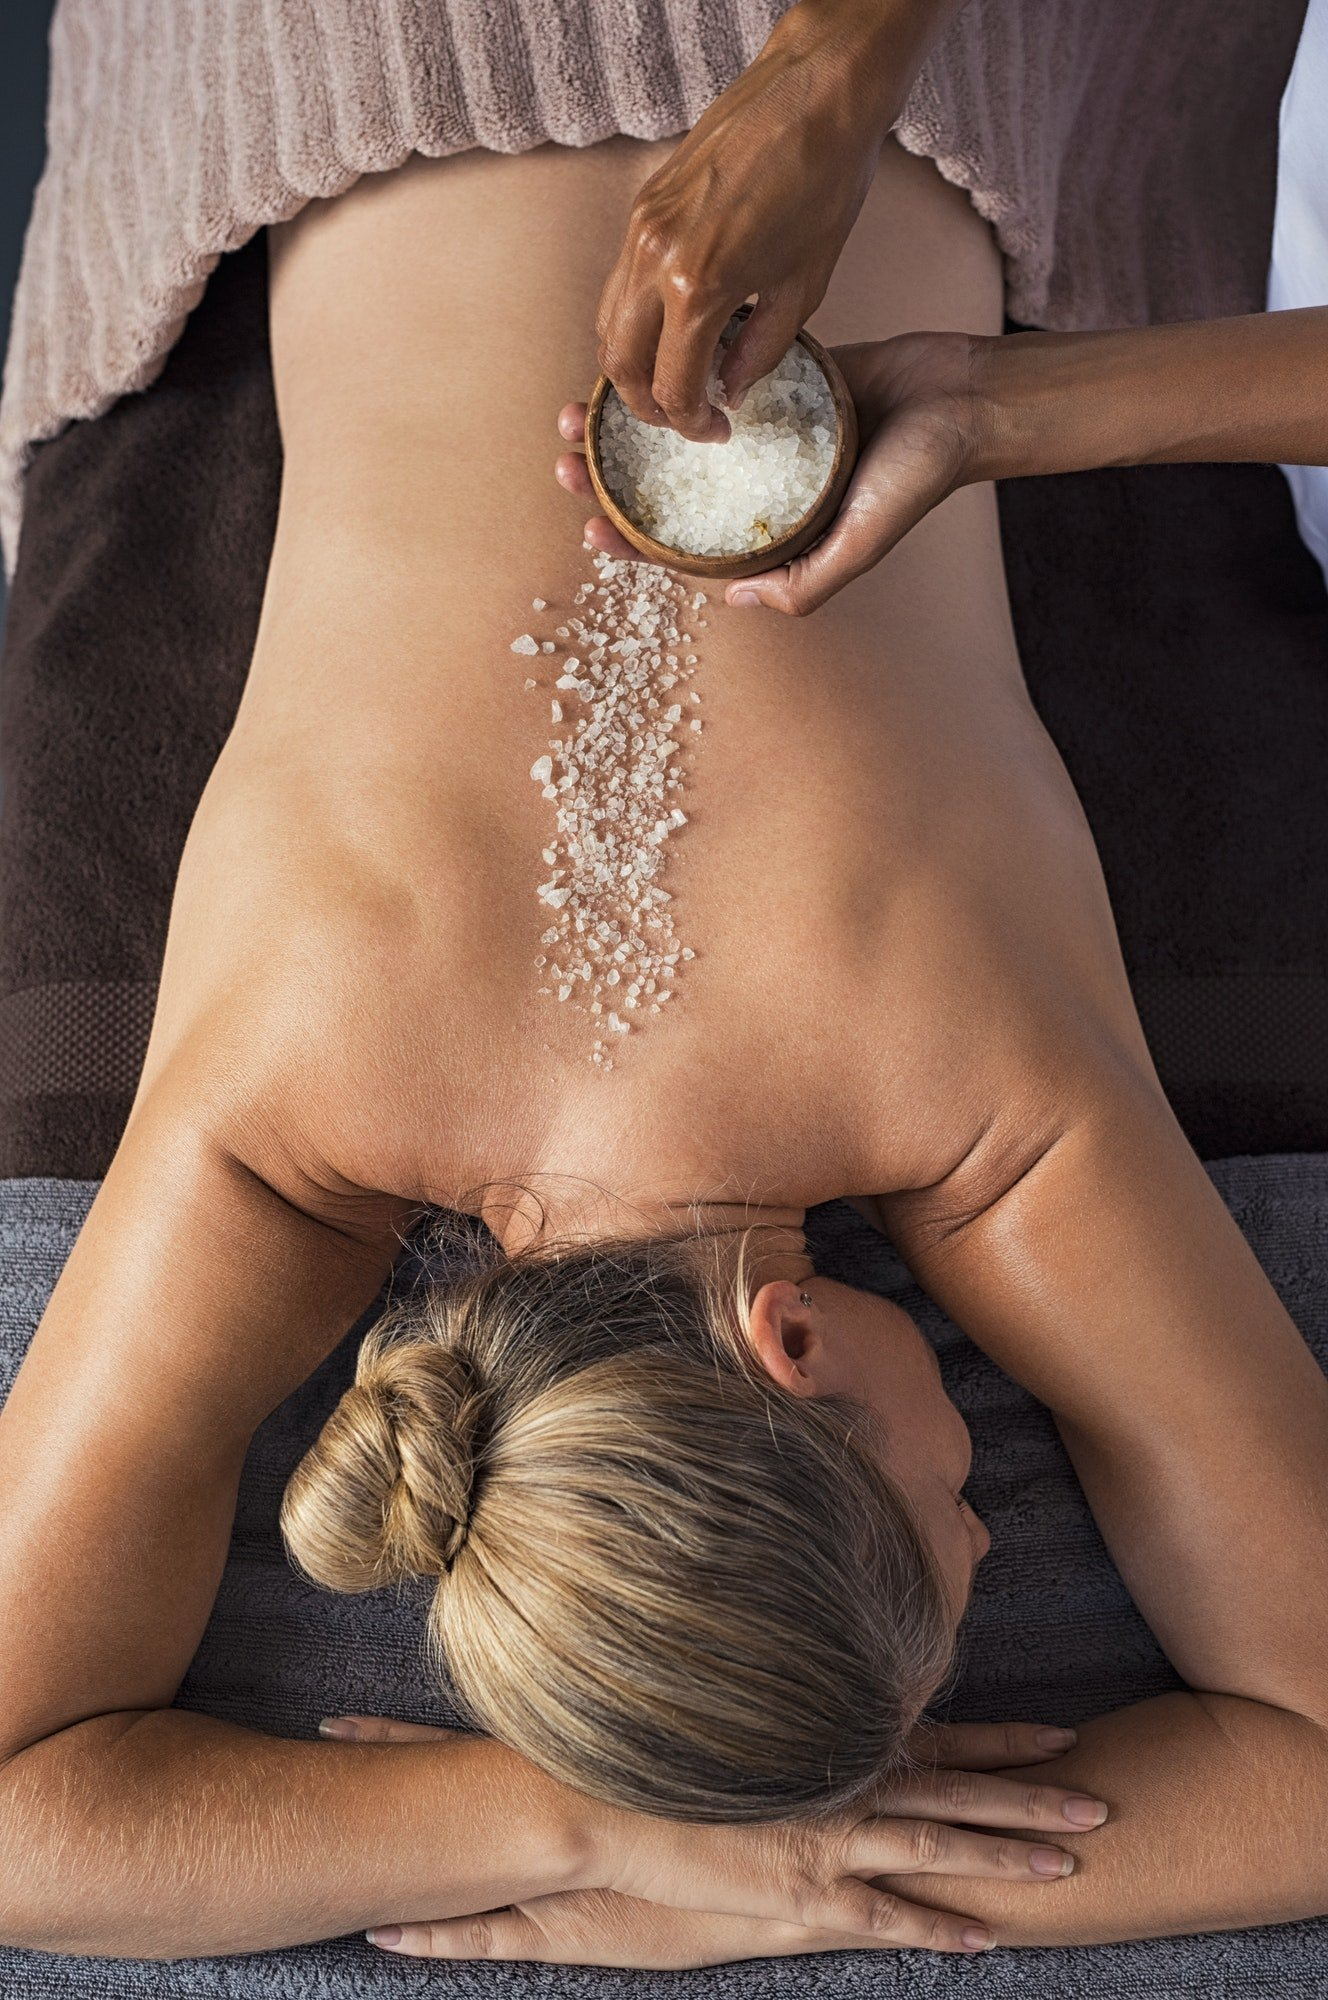 Mature woman enjoying a salt scrub massage at spa